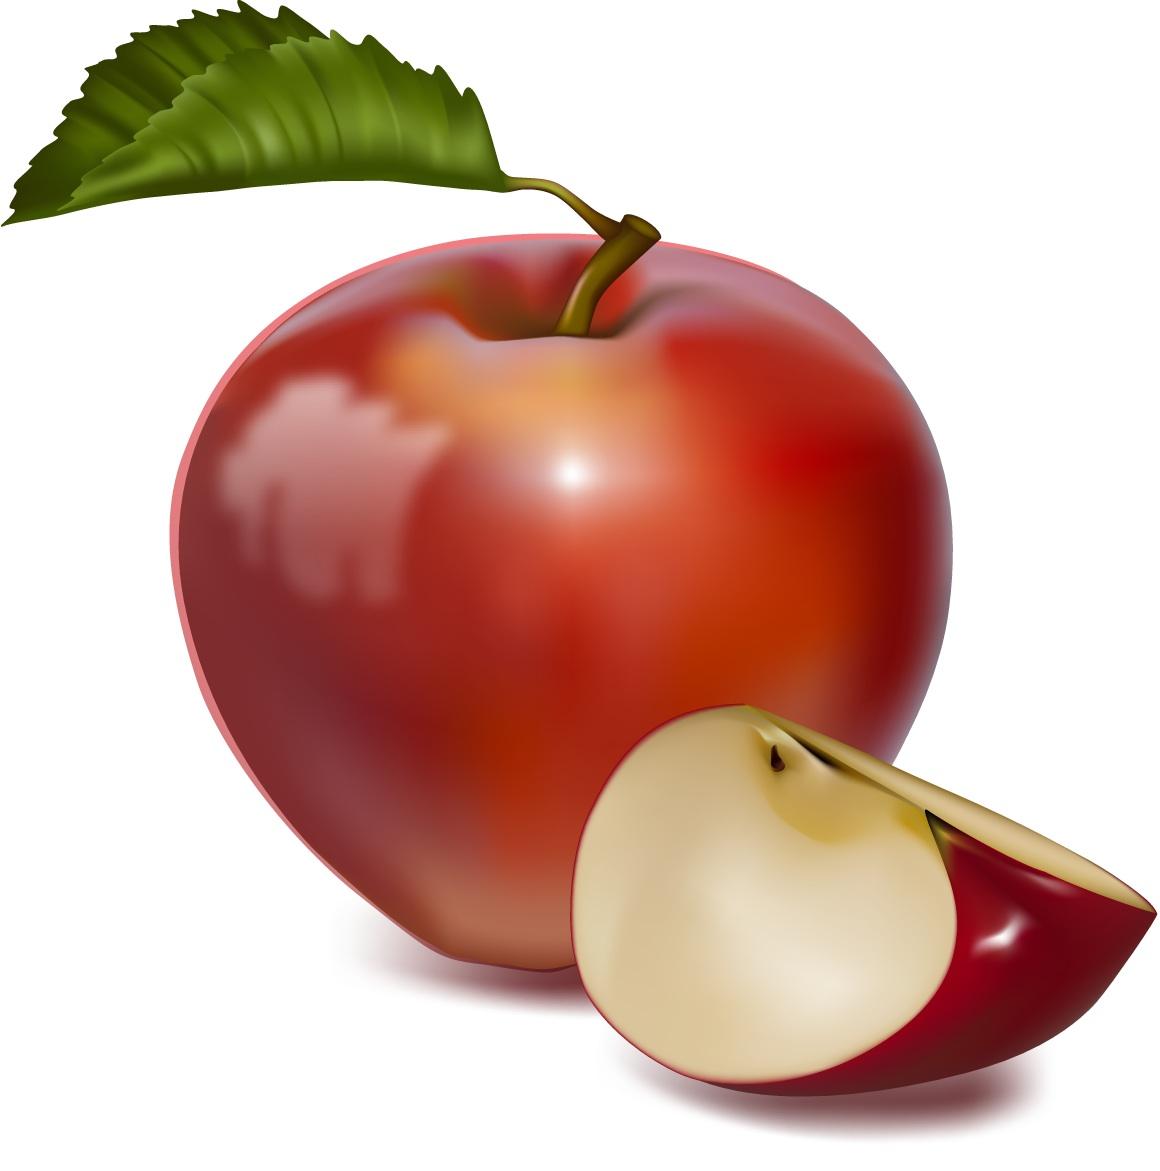 apple_2a.jpg